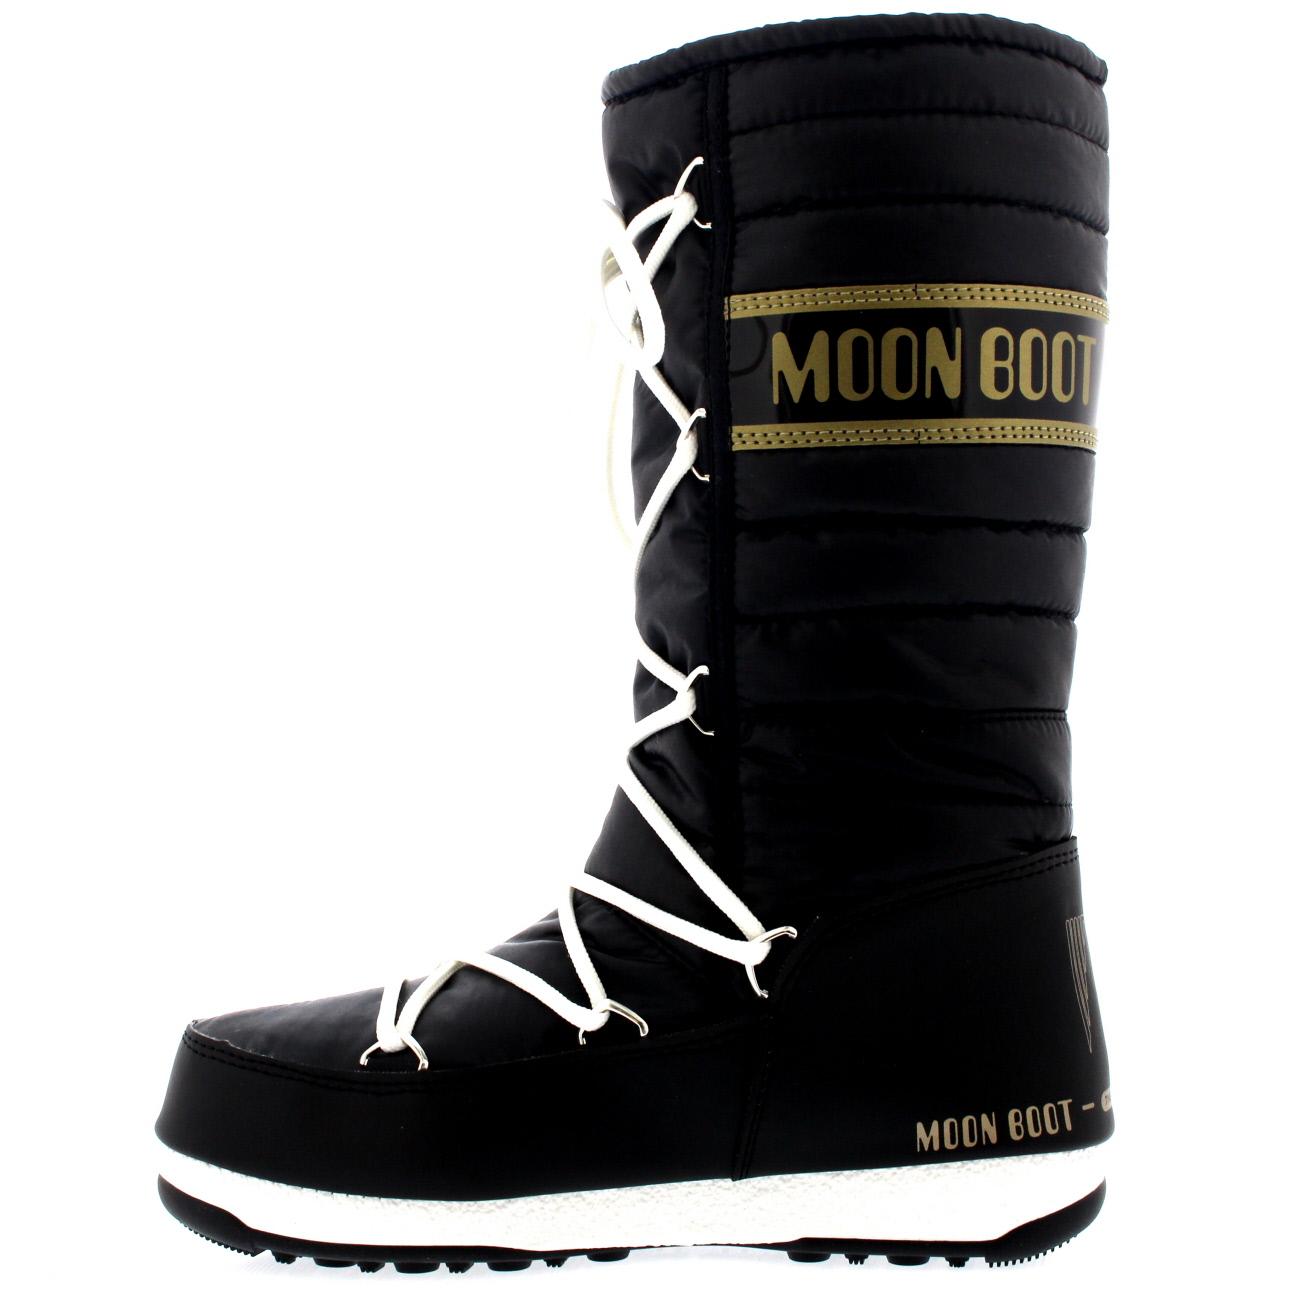 Damenschuhe Tecnica Original Moon Boot Boot Boot Quilted Winter Snow Mid Calf Stiefel US 5.5-10 c87c8d